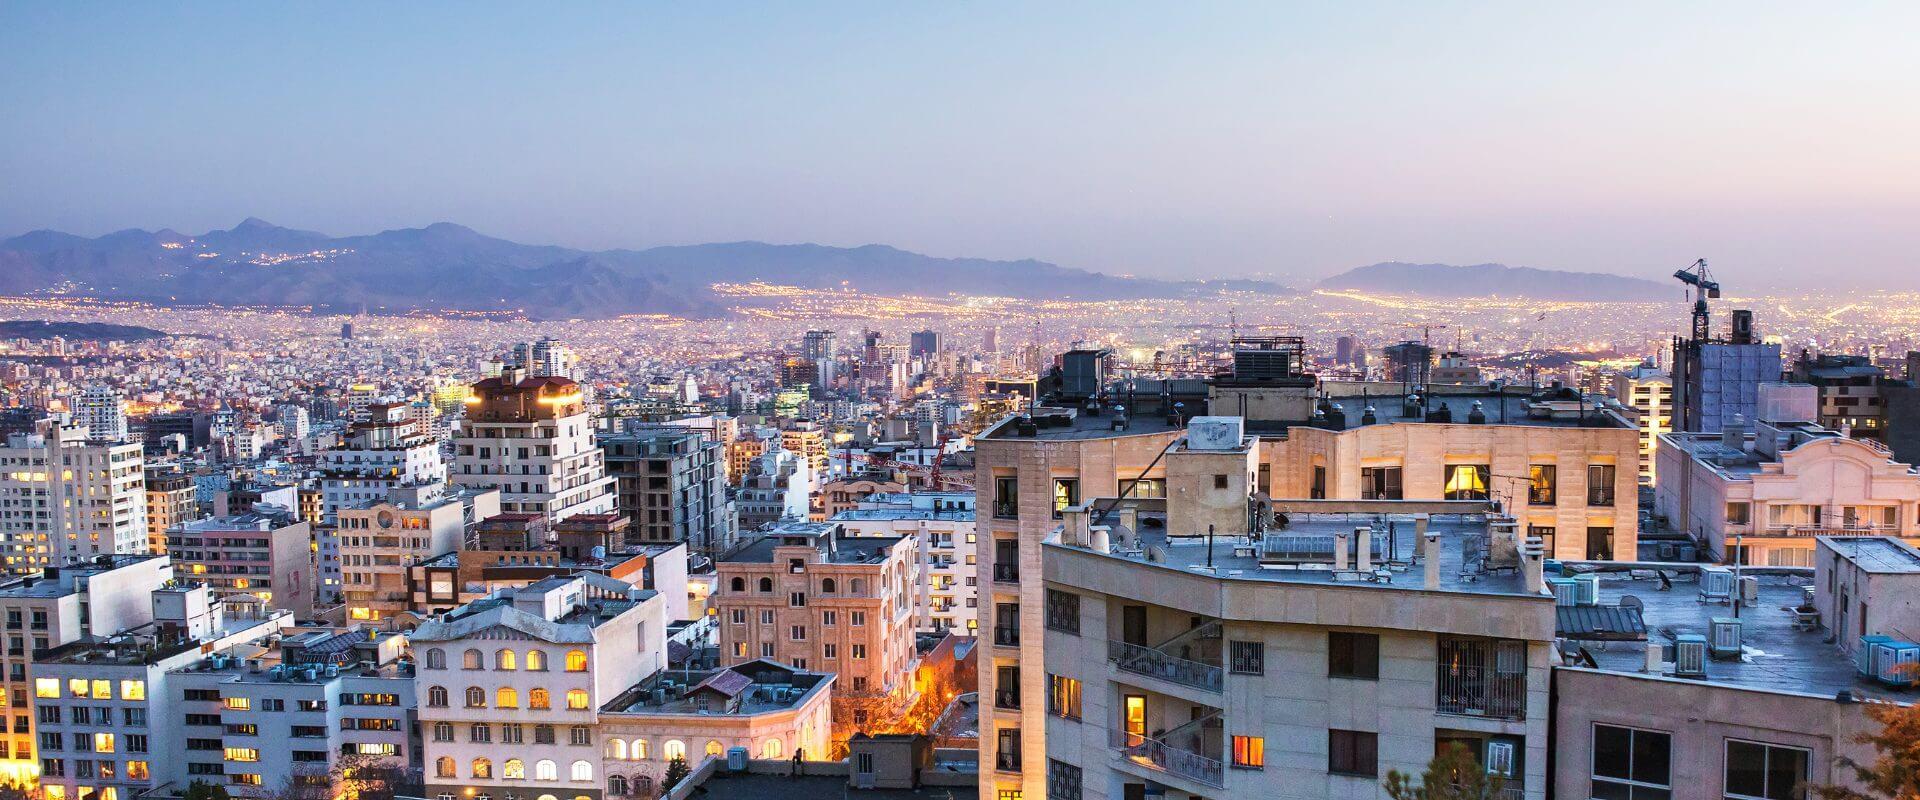 Bild Teheran